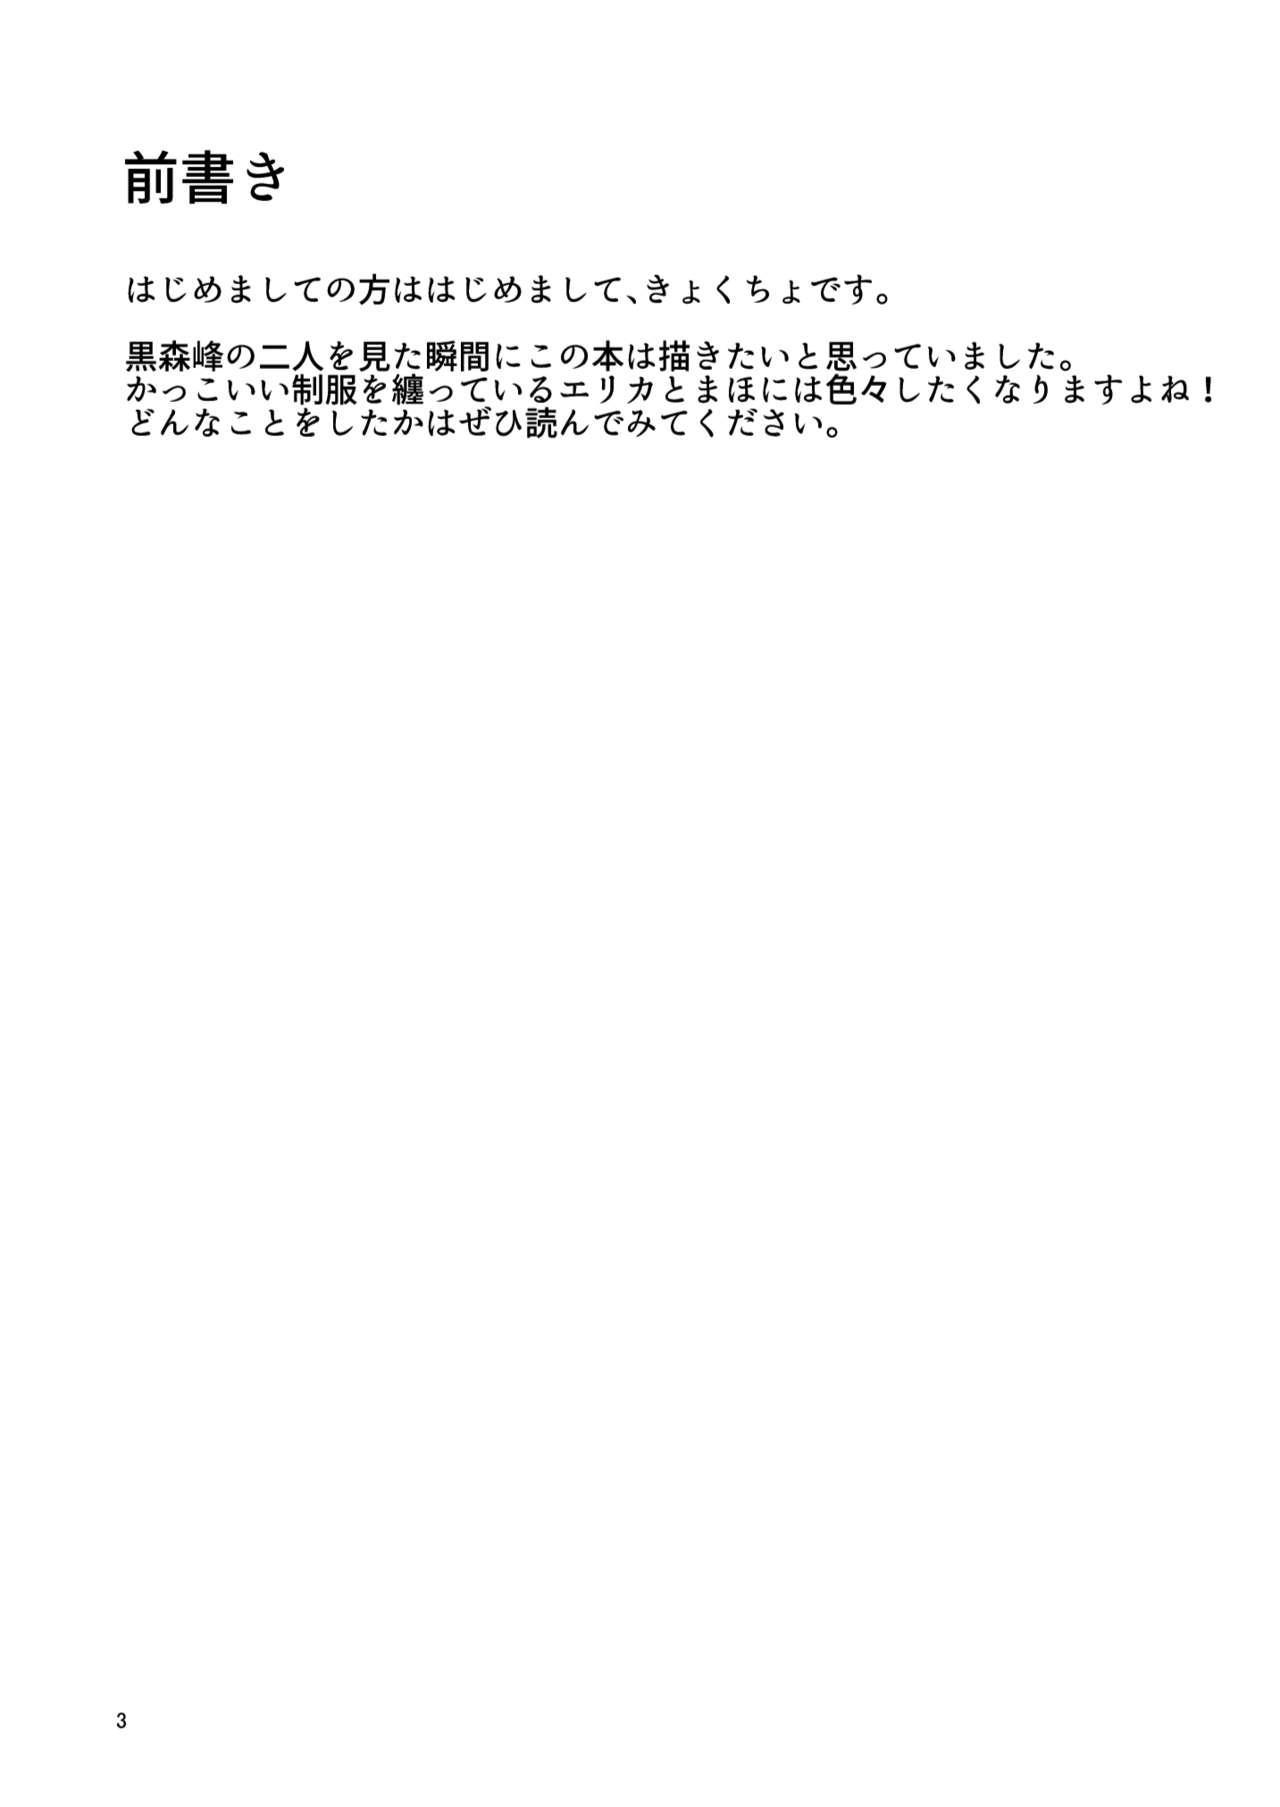 Kuromorimine Ryoujoku 1